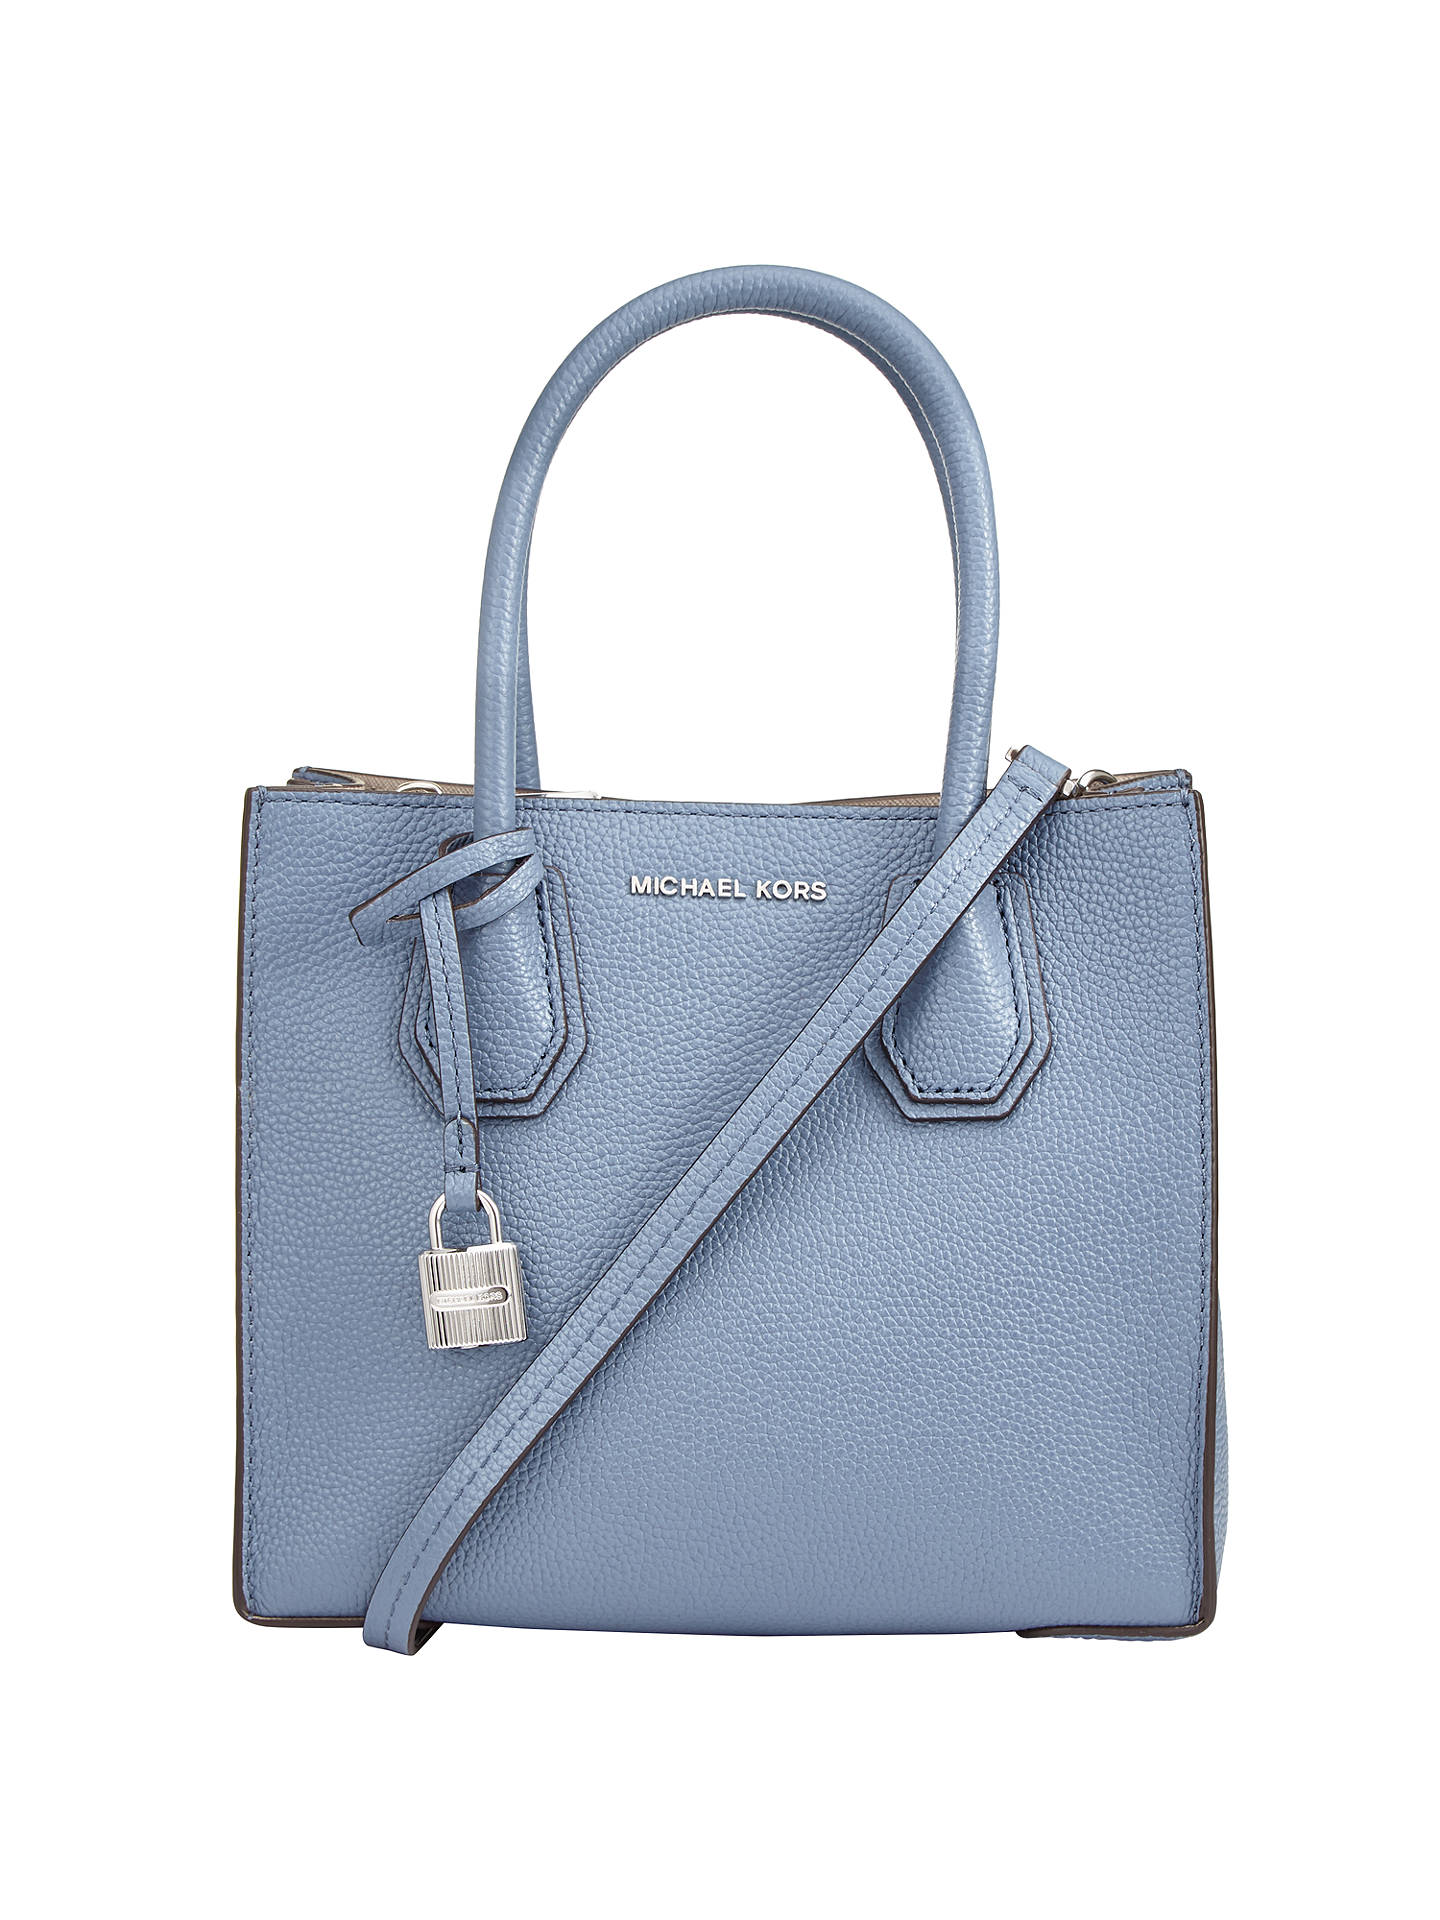 fda052b8c4b3 Buy MICHAEL Michael Kors Mercer Leather Messenger Bag, Denim Online at  johnlewis.com ...